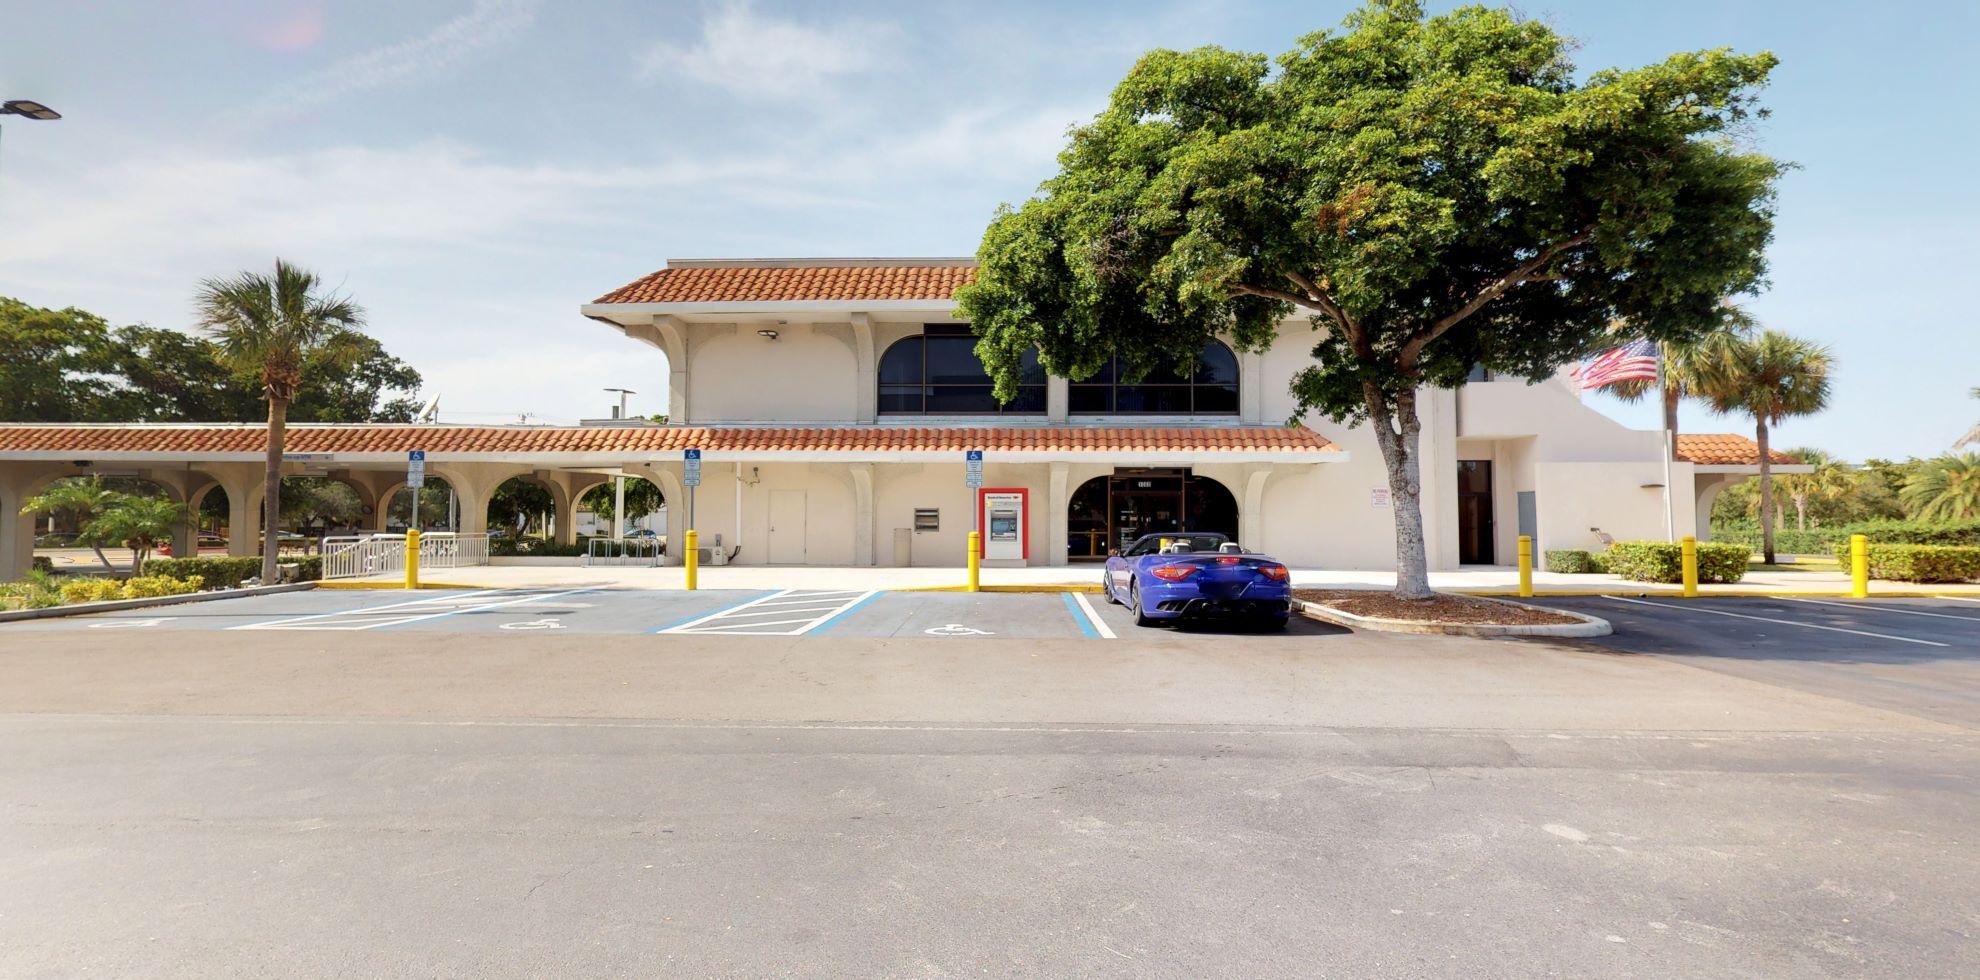 Bank of America financial center with drive-thru ATM   1000 N Federal Hwy, Boca Raton, FL 33432